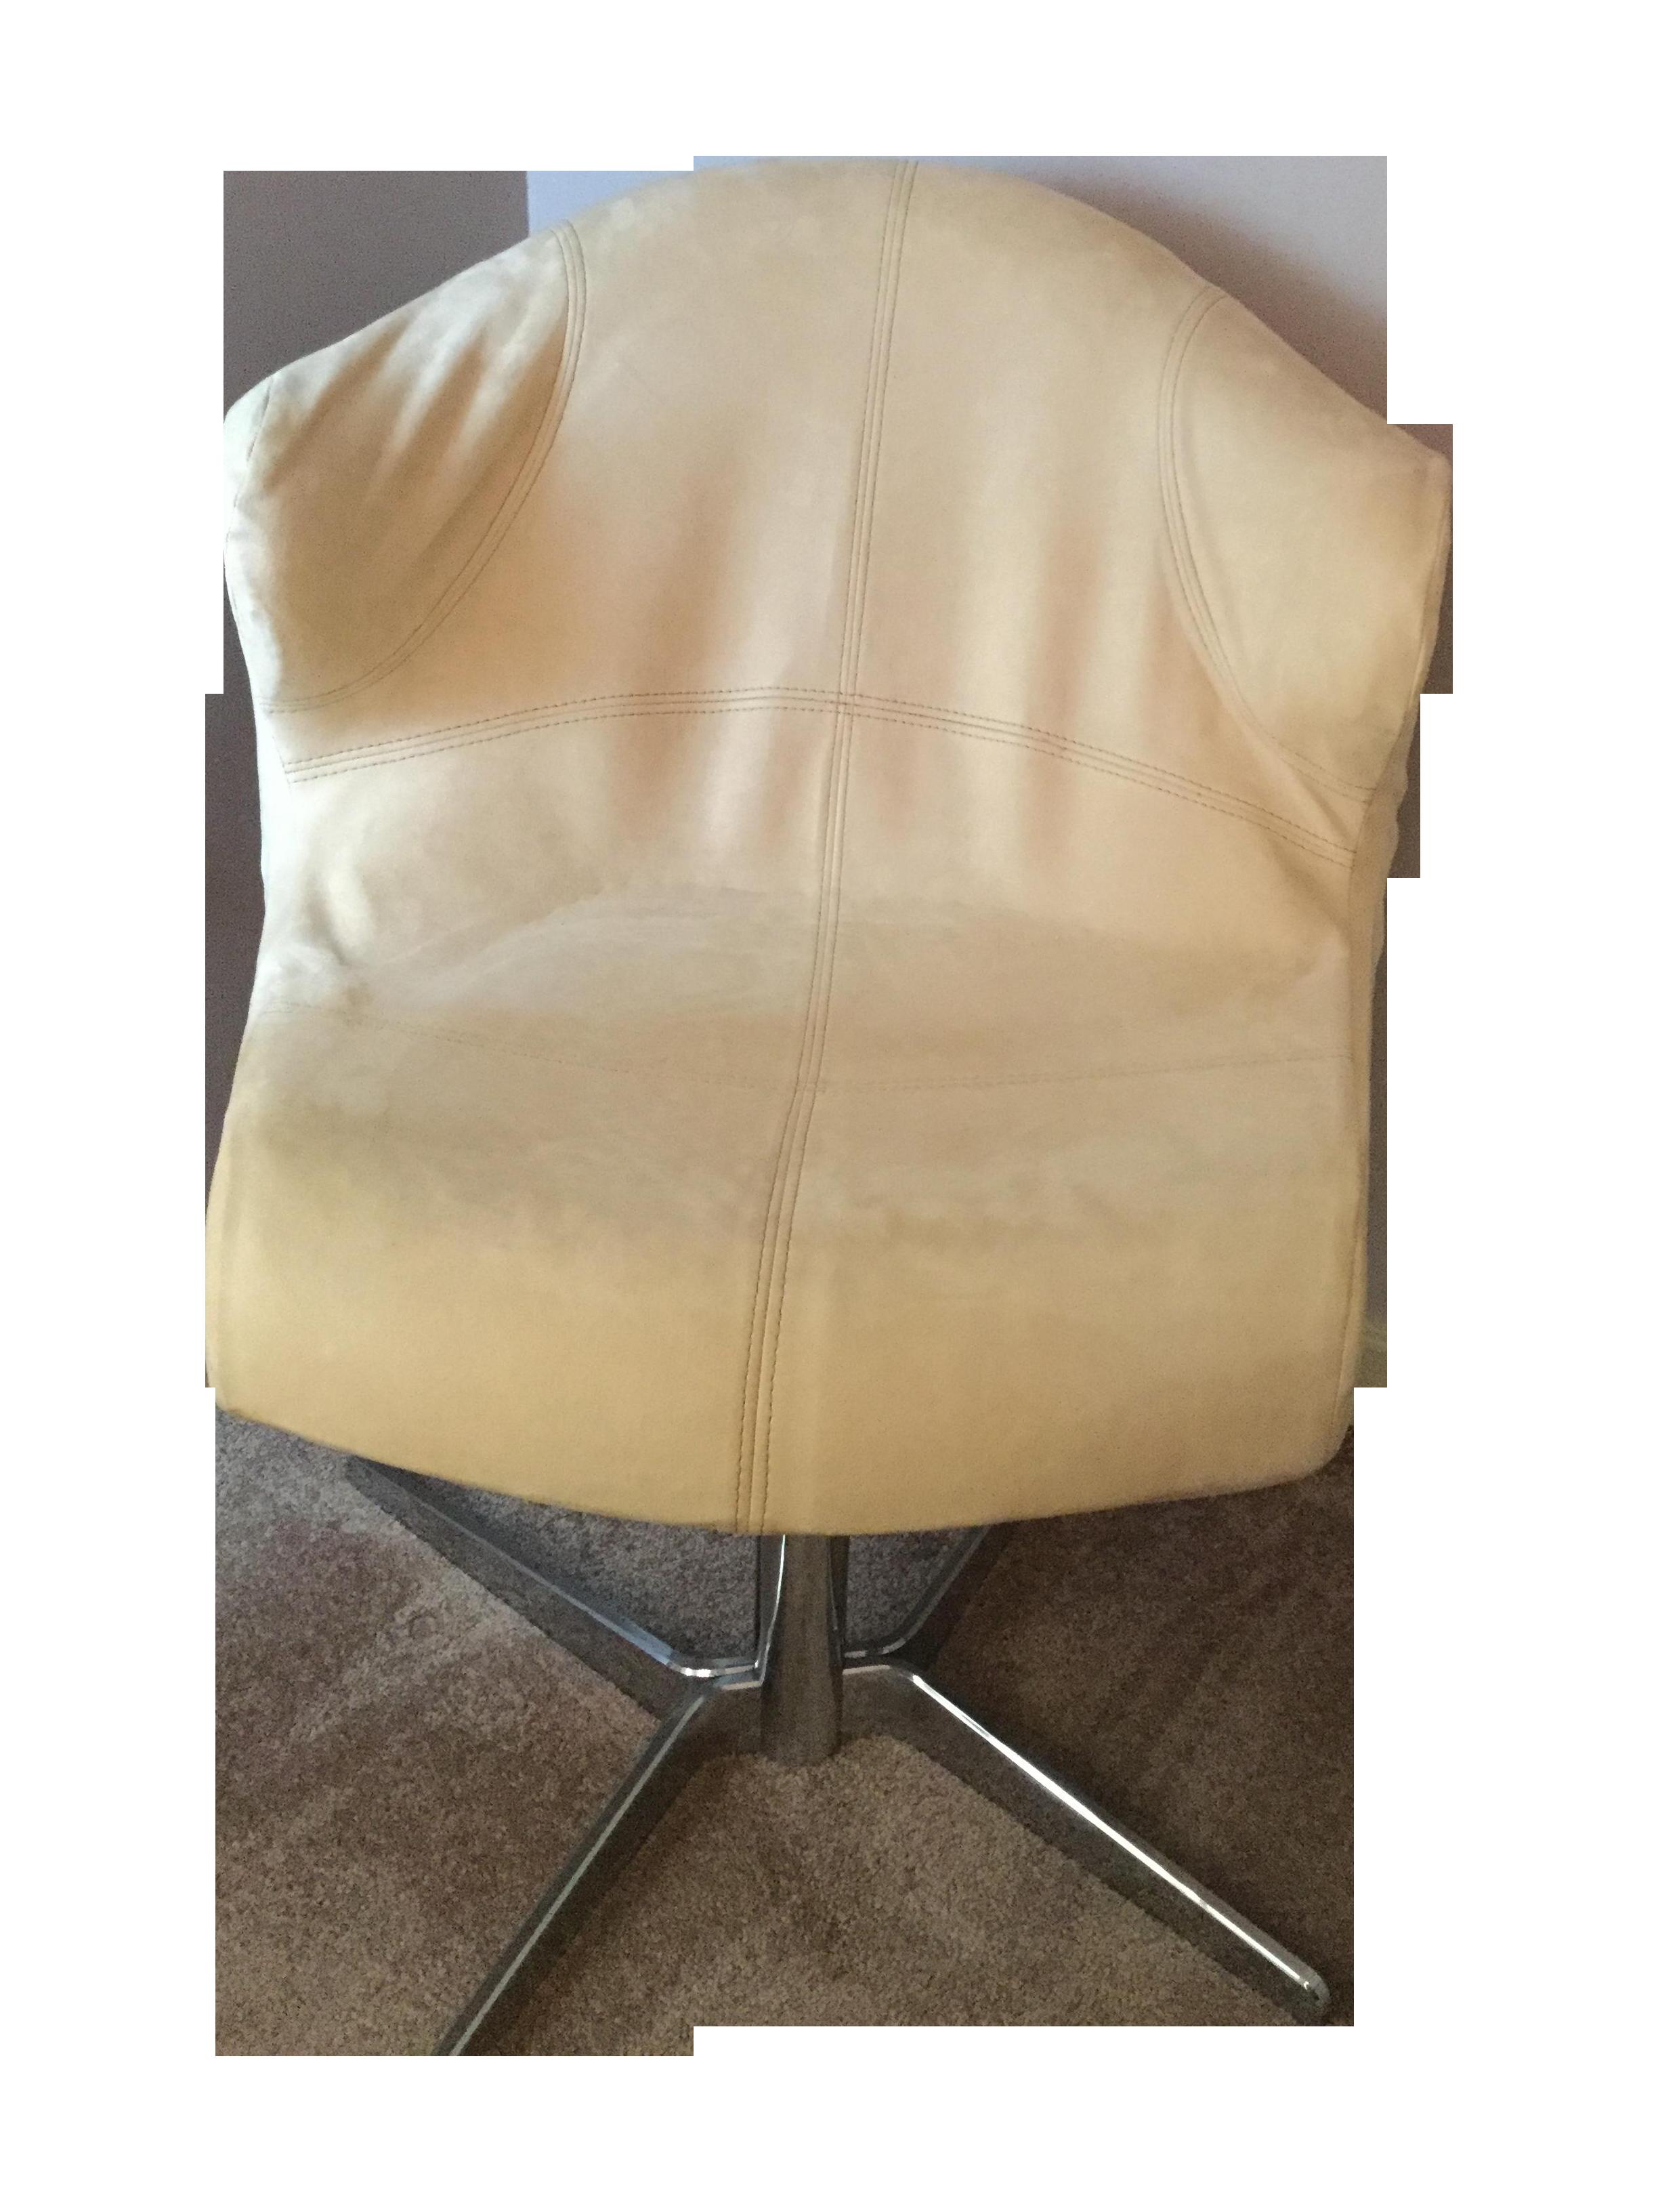 ligne roset alster chair chairish. Black Bedroom Furniture Sets. Home Design Ideas